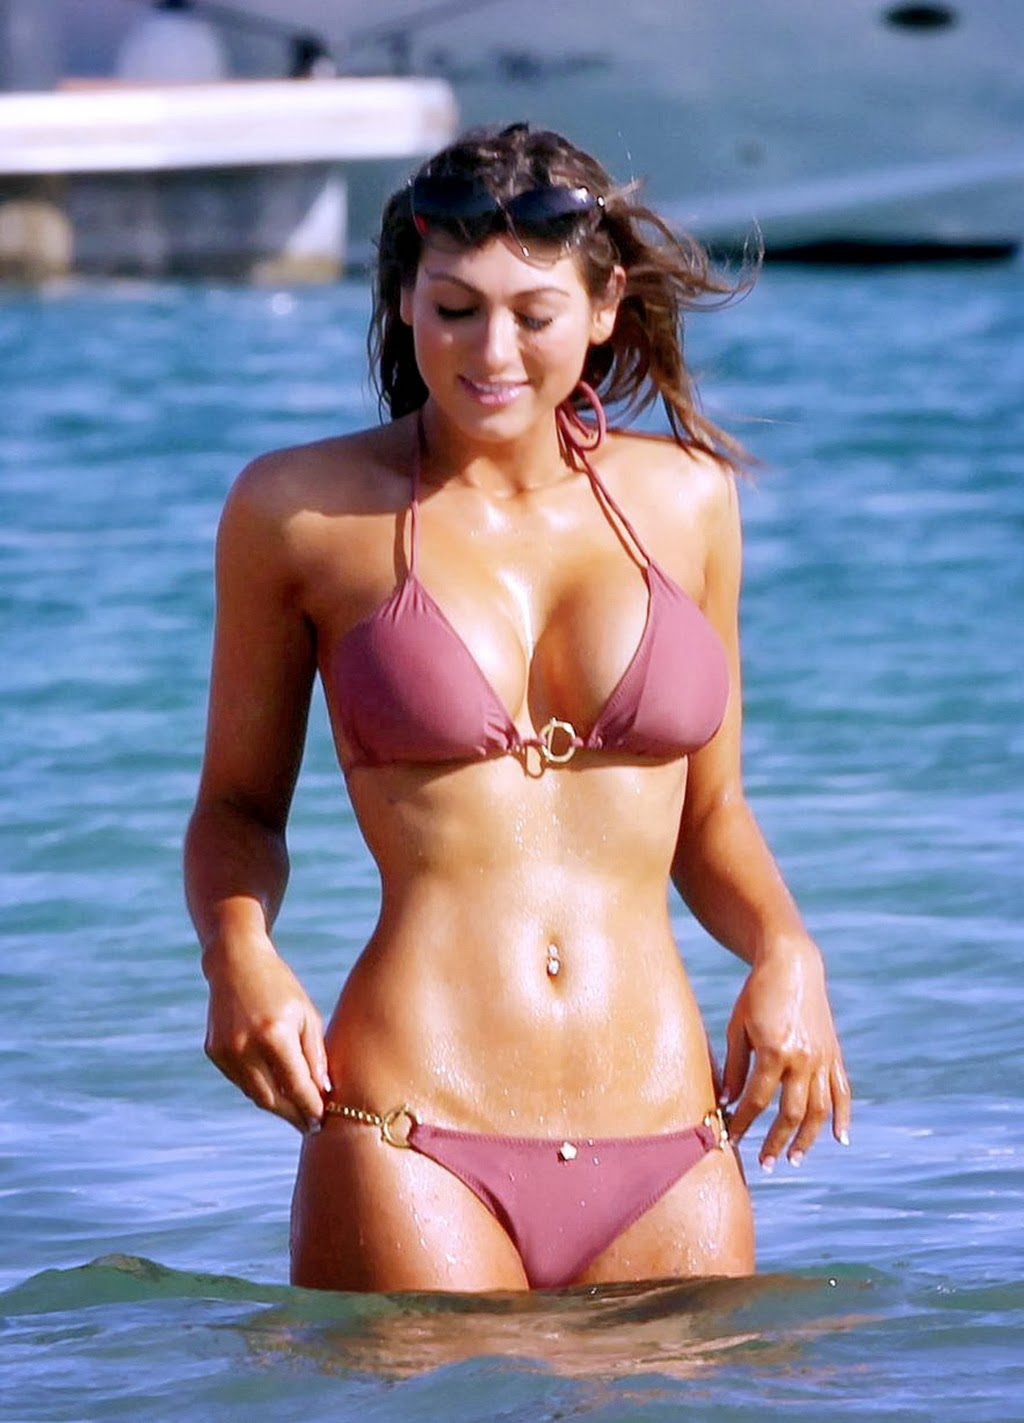 Luisa Zissman showing off her bikini body on a beach in Dubai